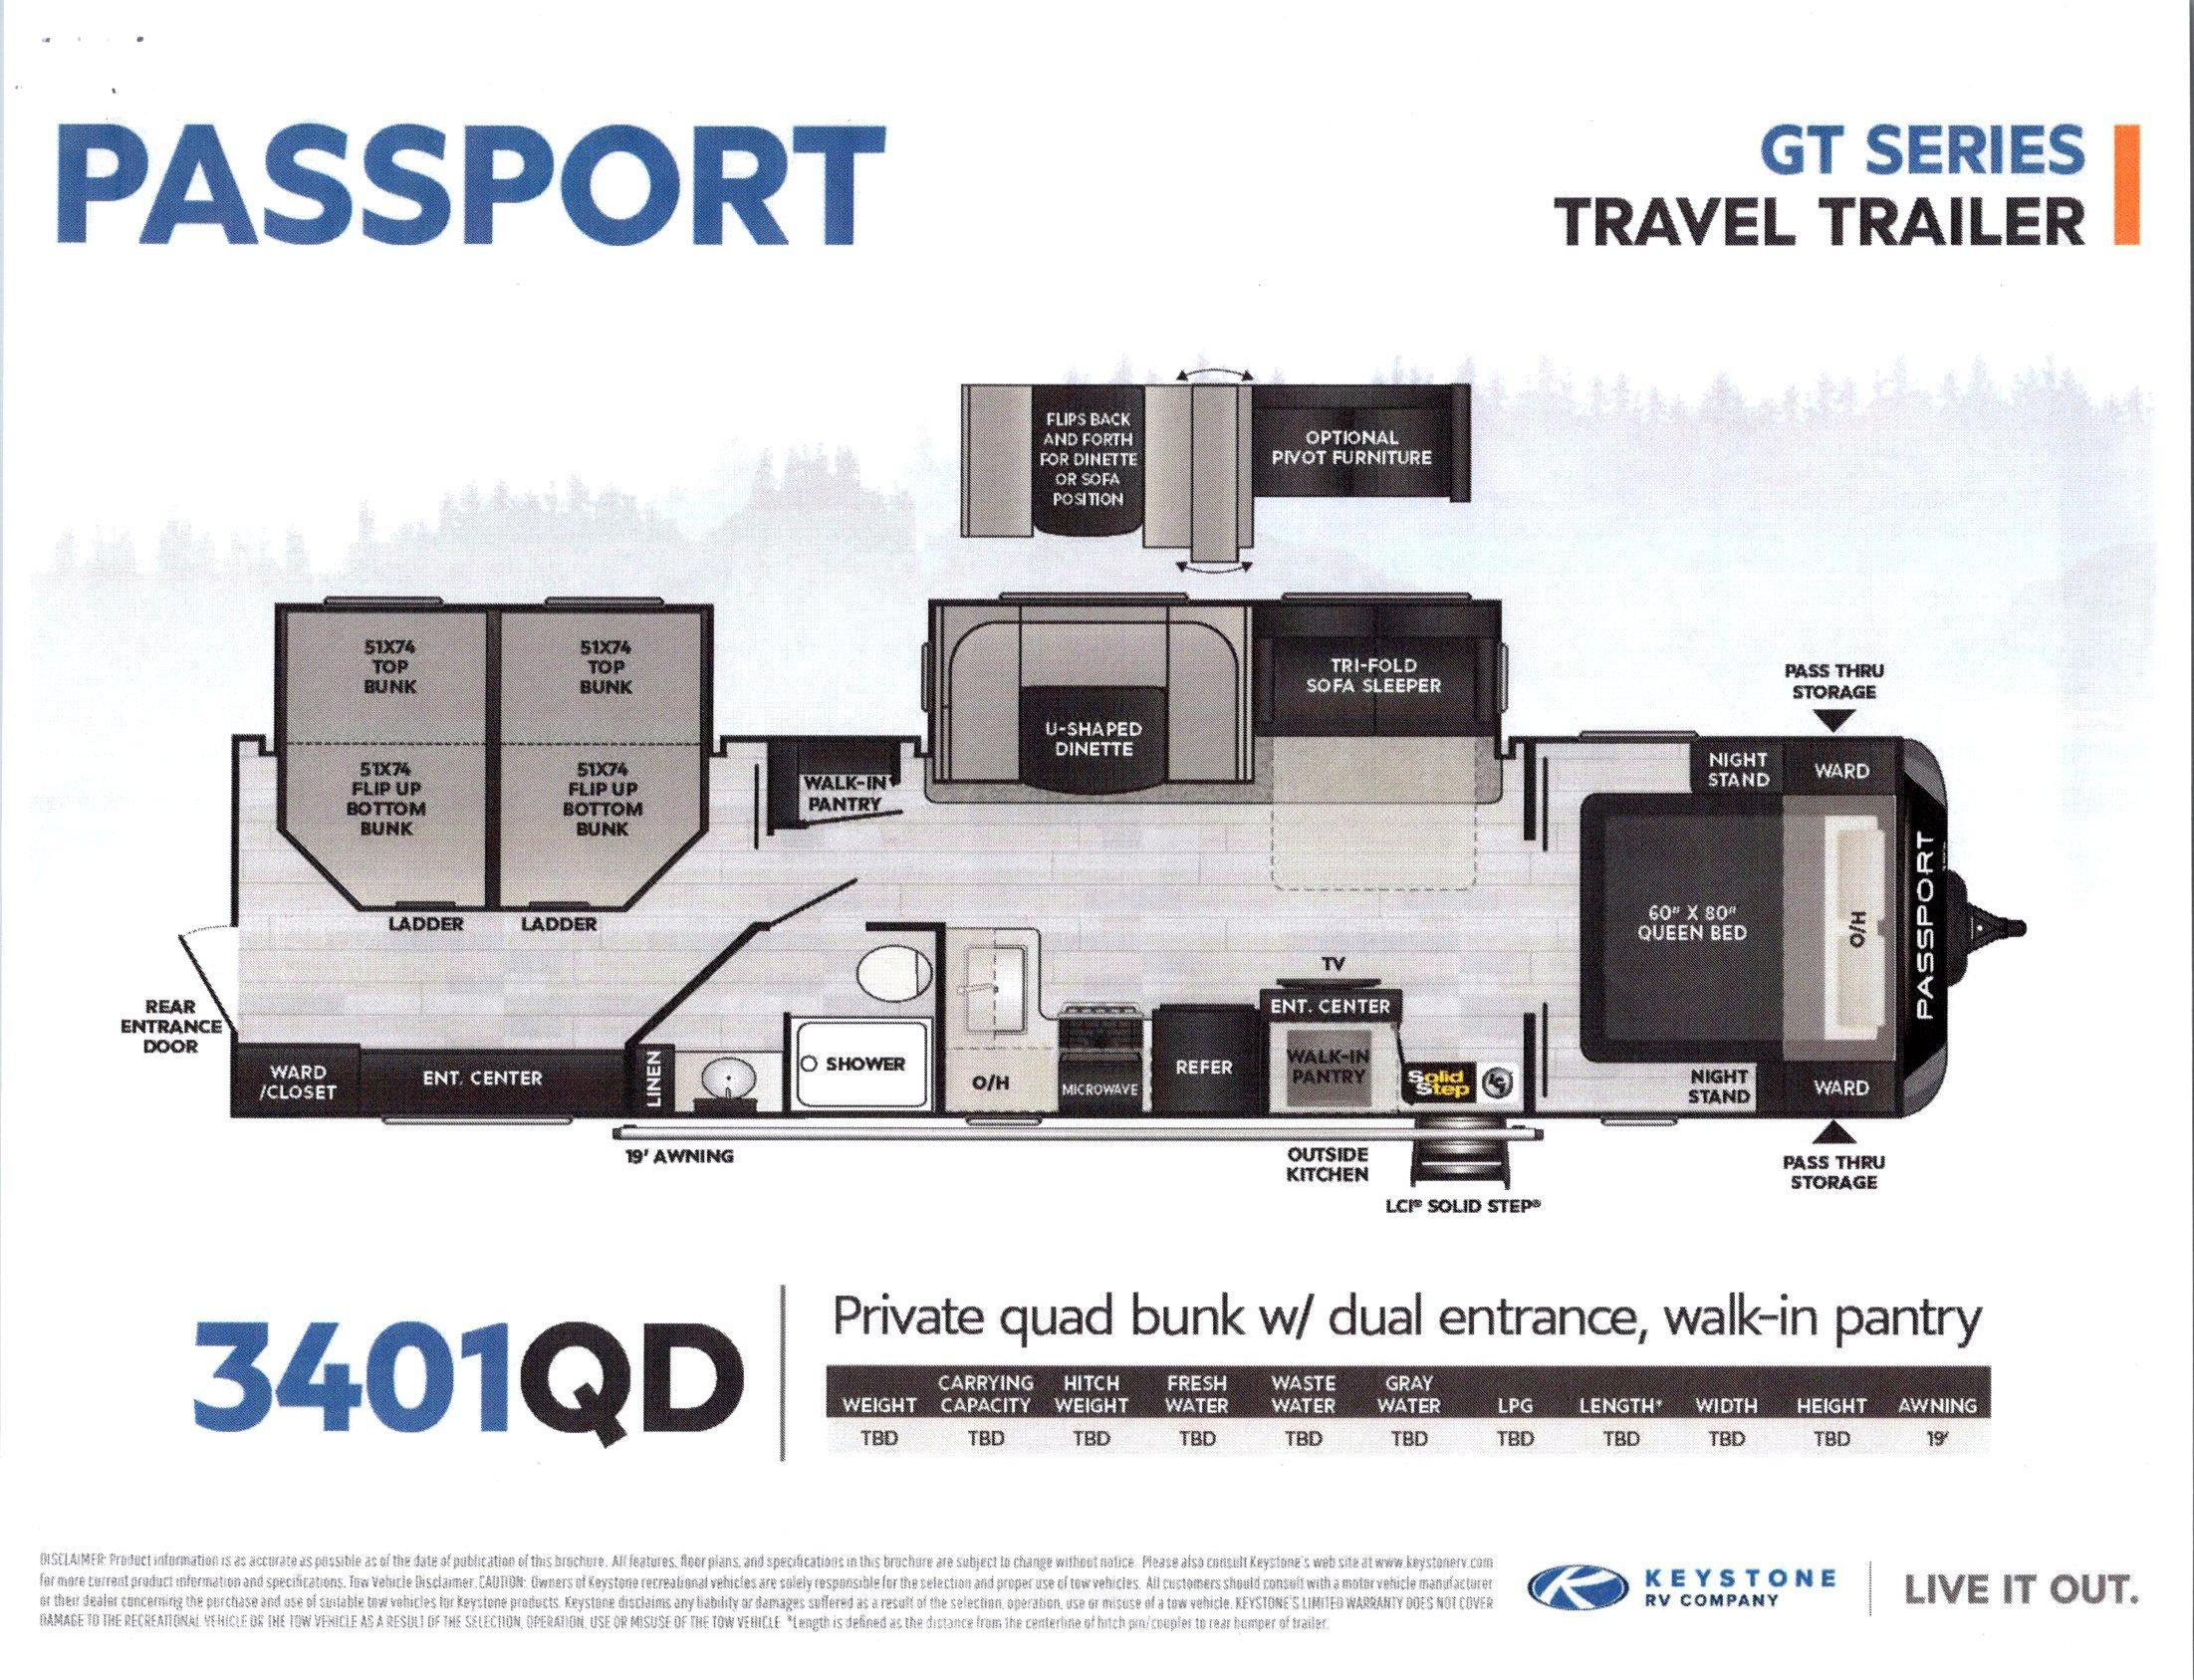 2021 Passport 3401DQ GT Series